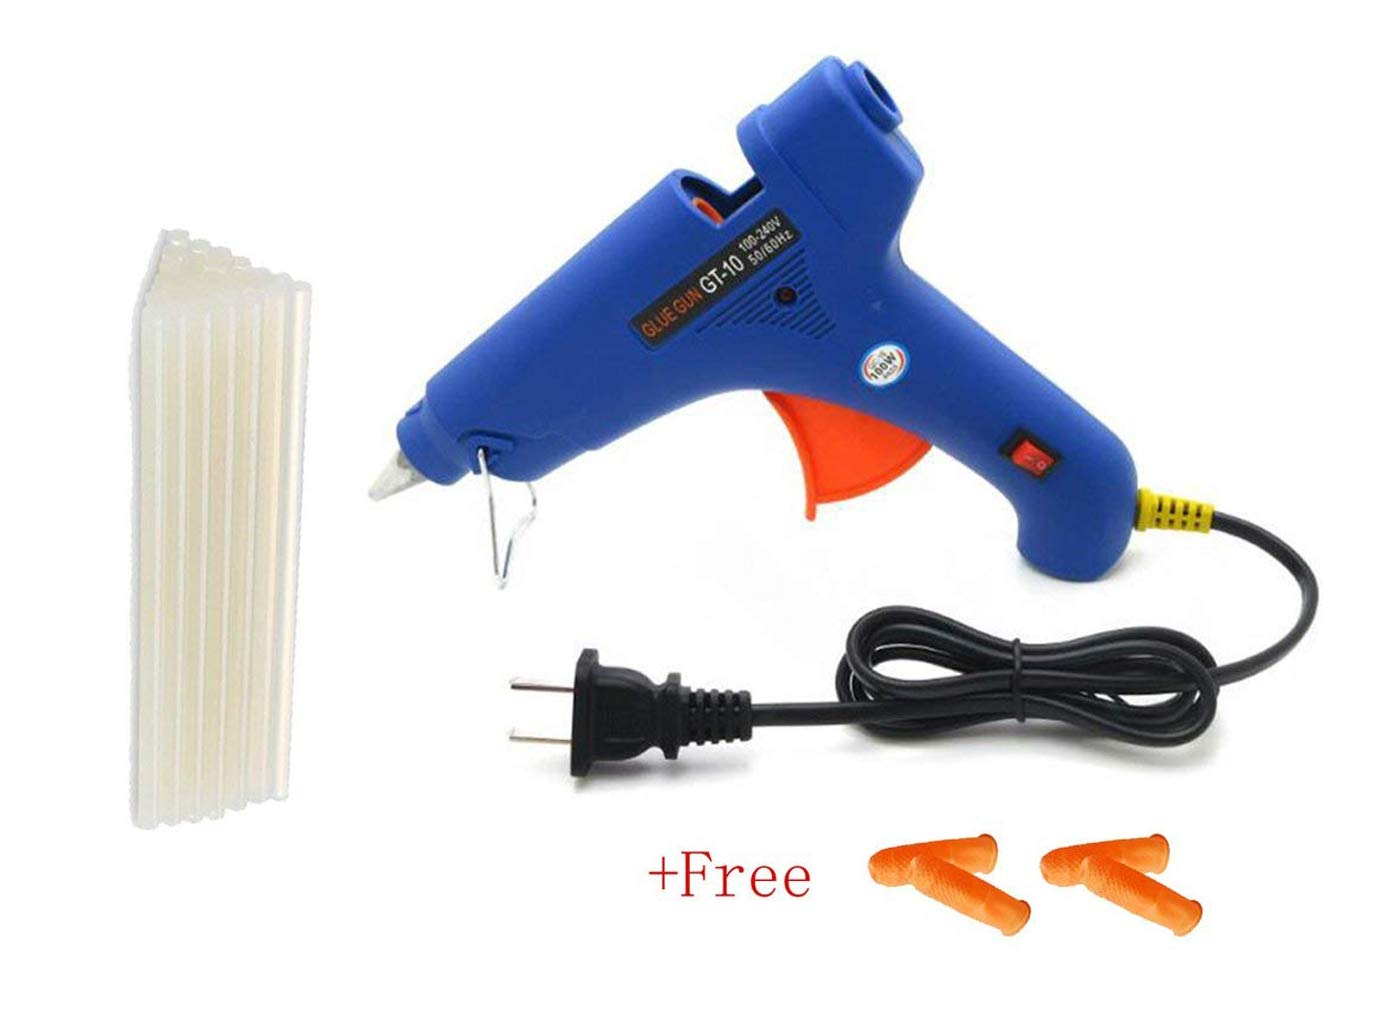 KingBra 100W Hot Glue Gun with 20pcs Transparent Glue Gun Sticks, Free 4pcs Finger Caps for Arts & Crafts, Sealing and Quick Repairs